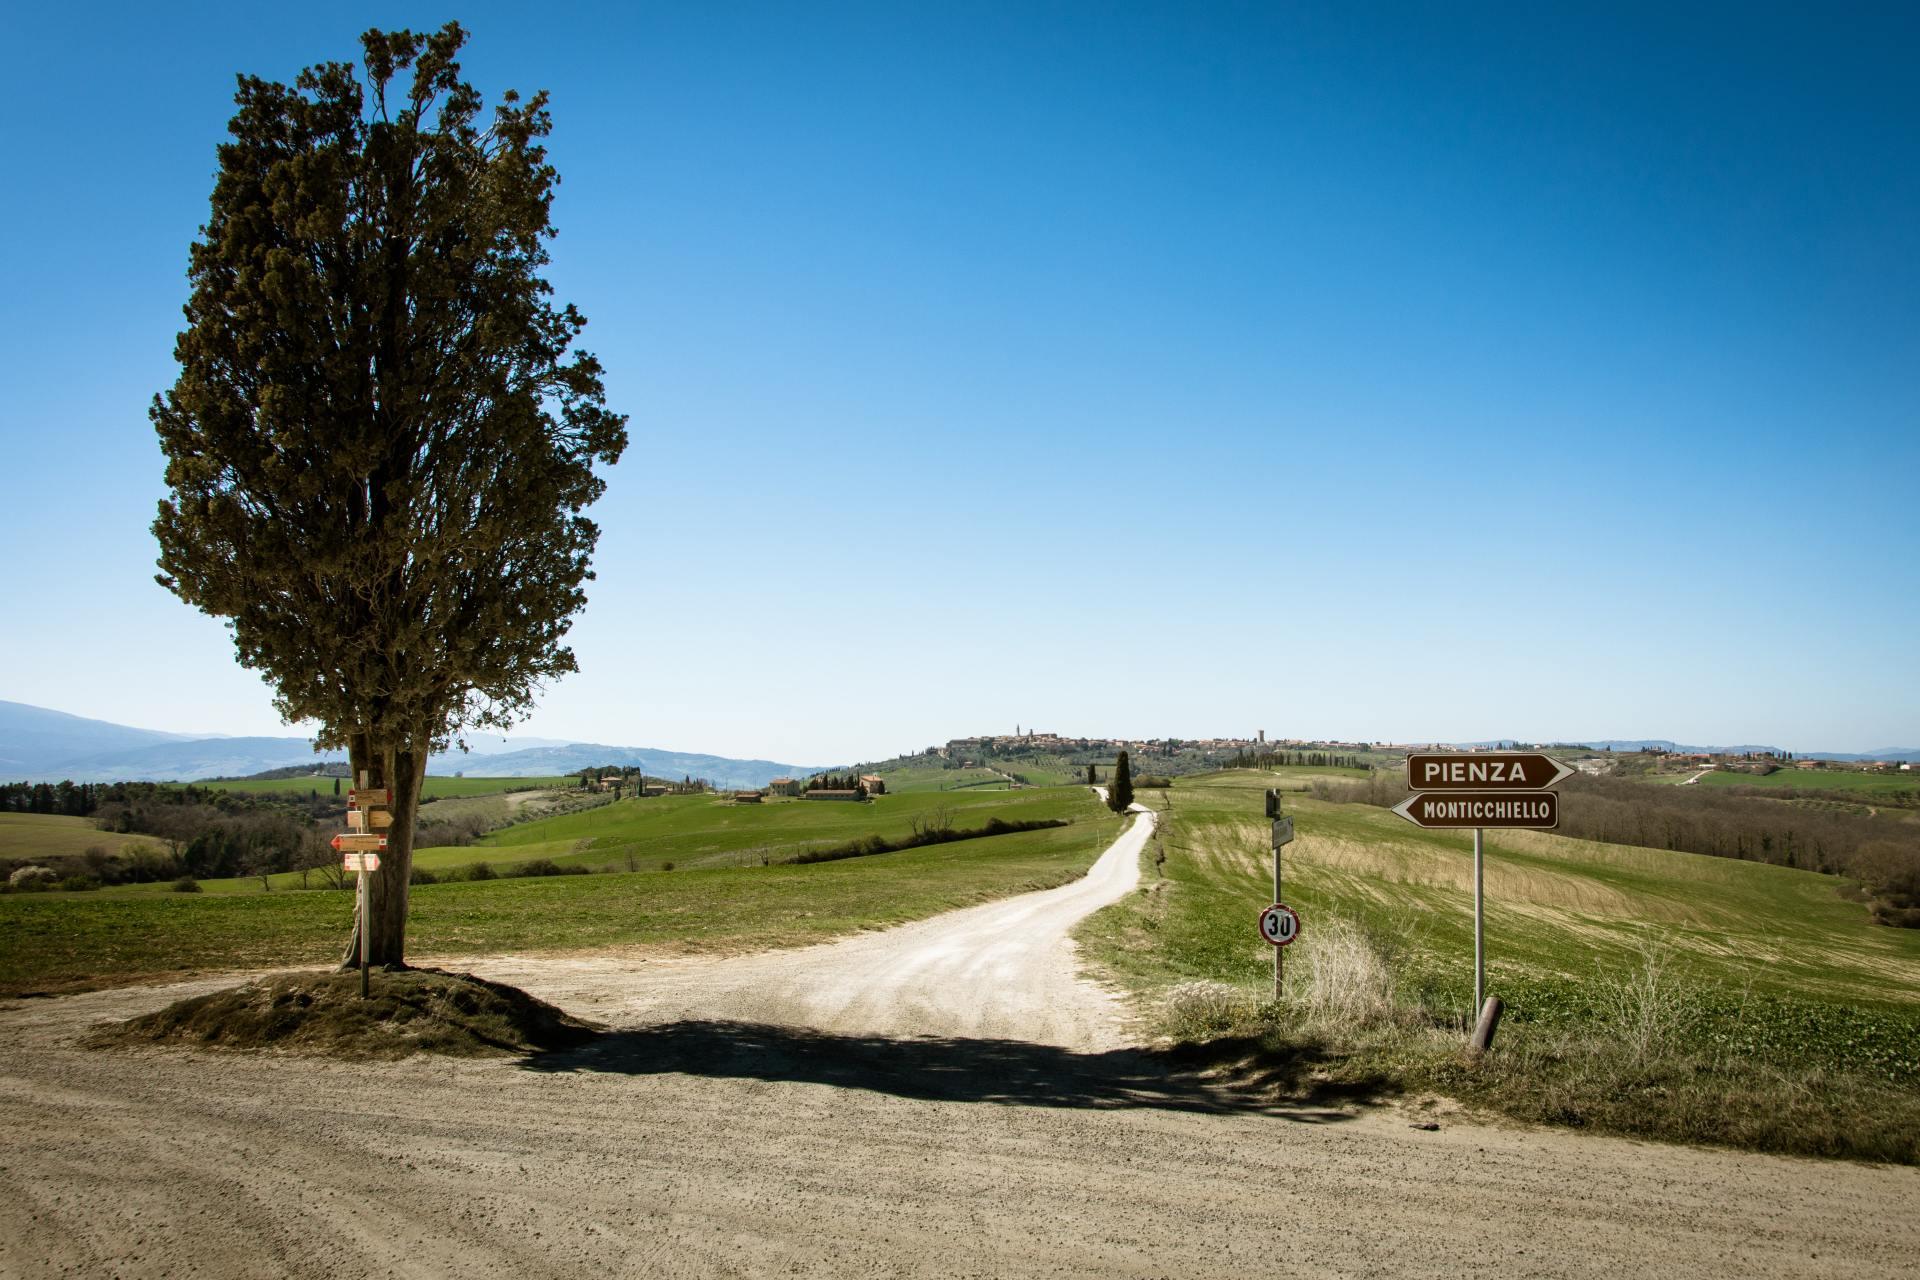 Weg met cipres in tussen Pienza en Monticchiello Toscane